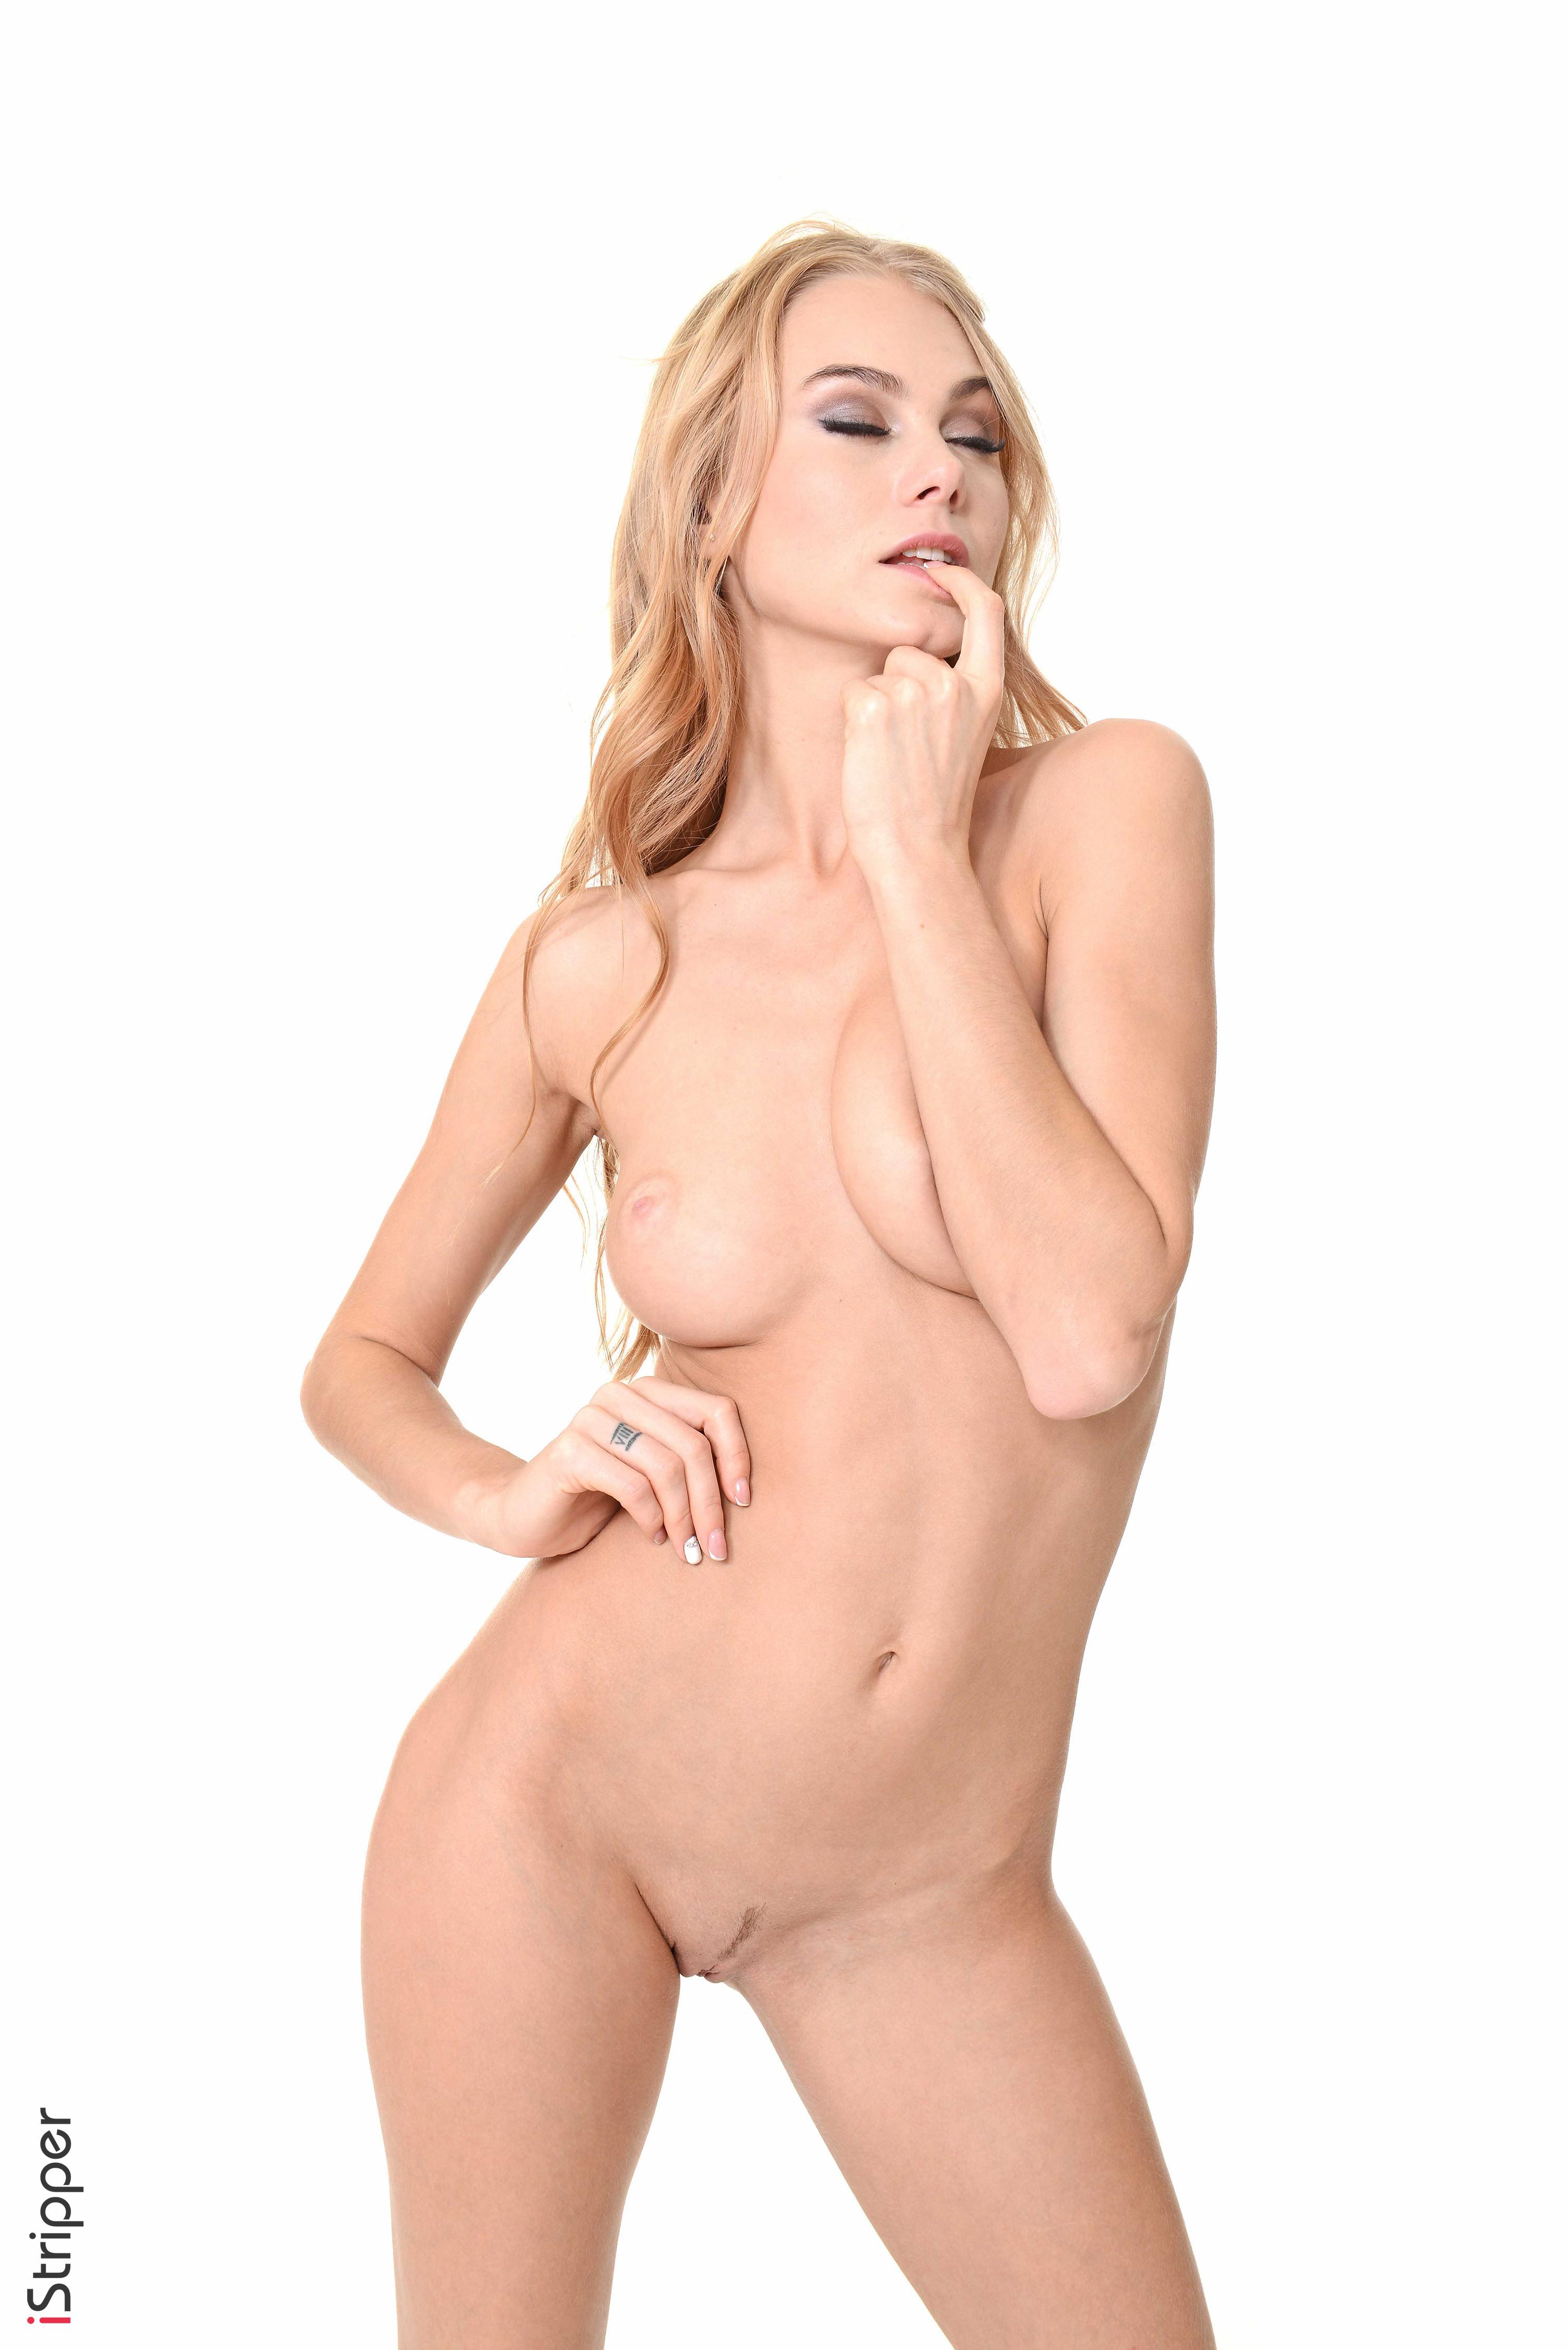 kimberly kisselovich naked